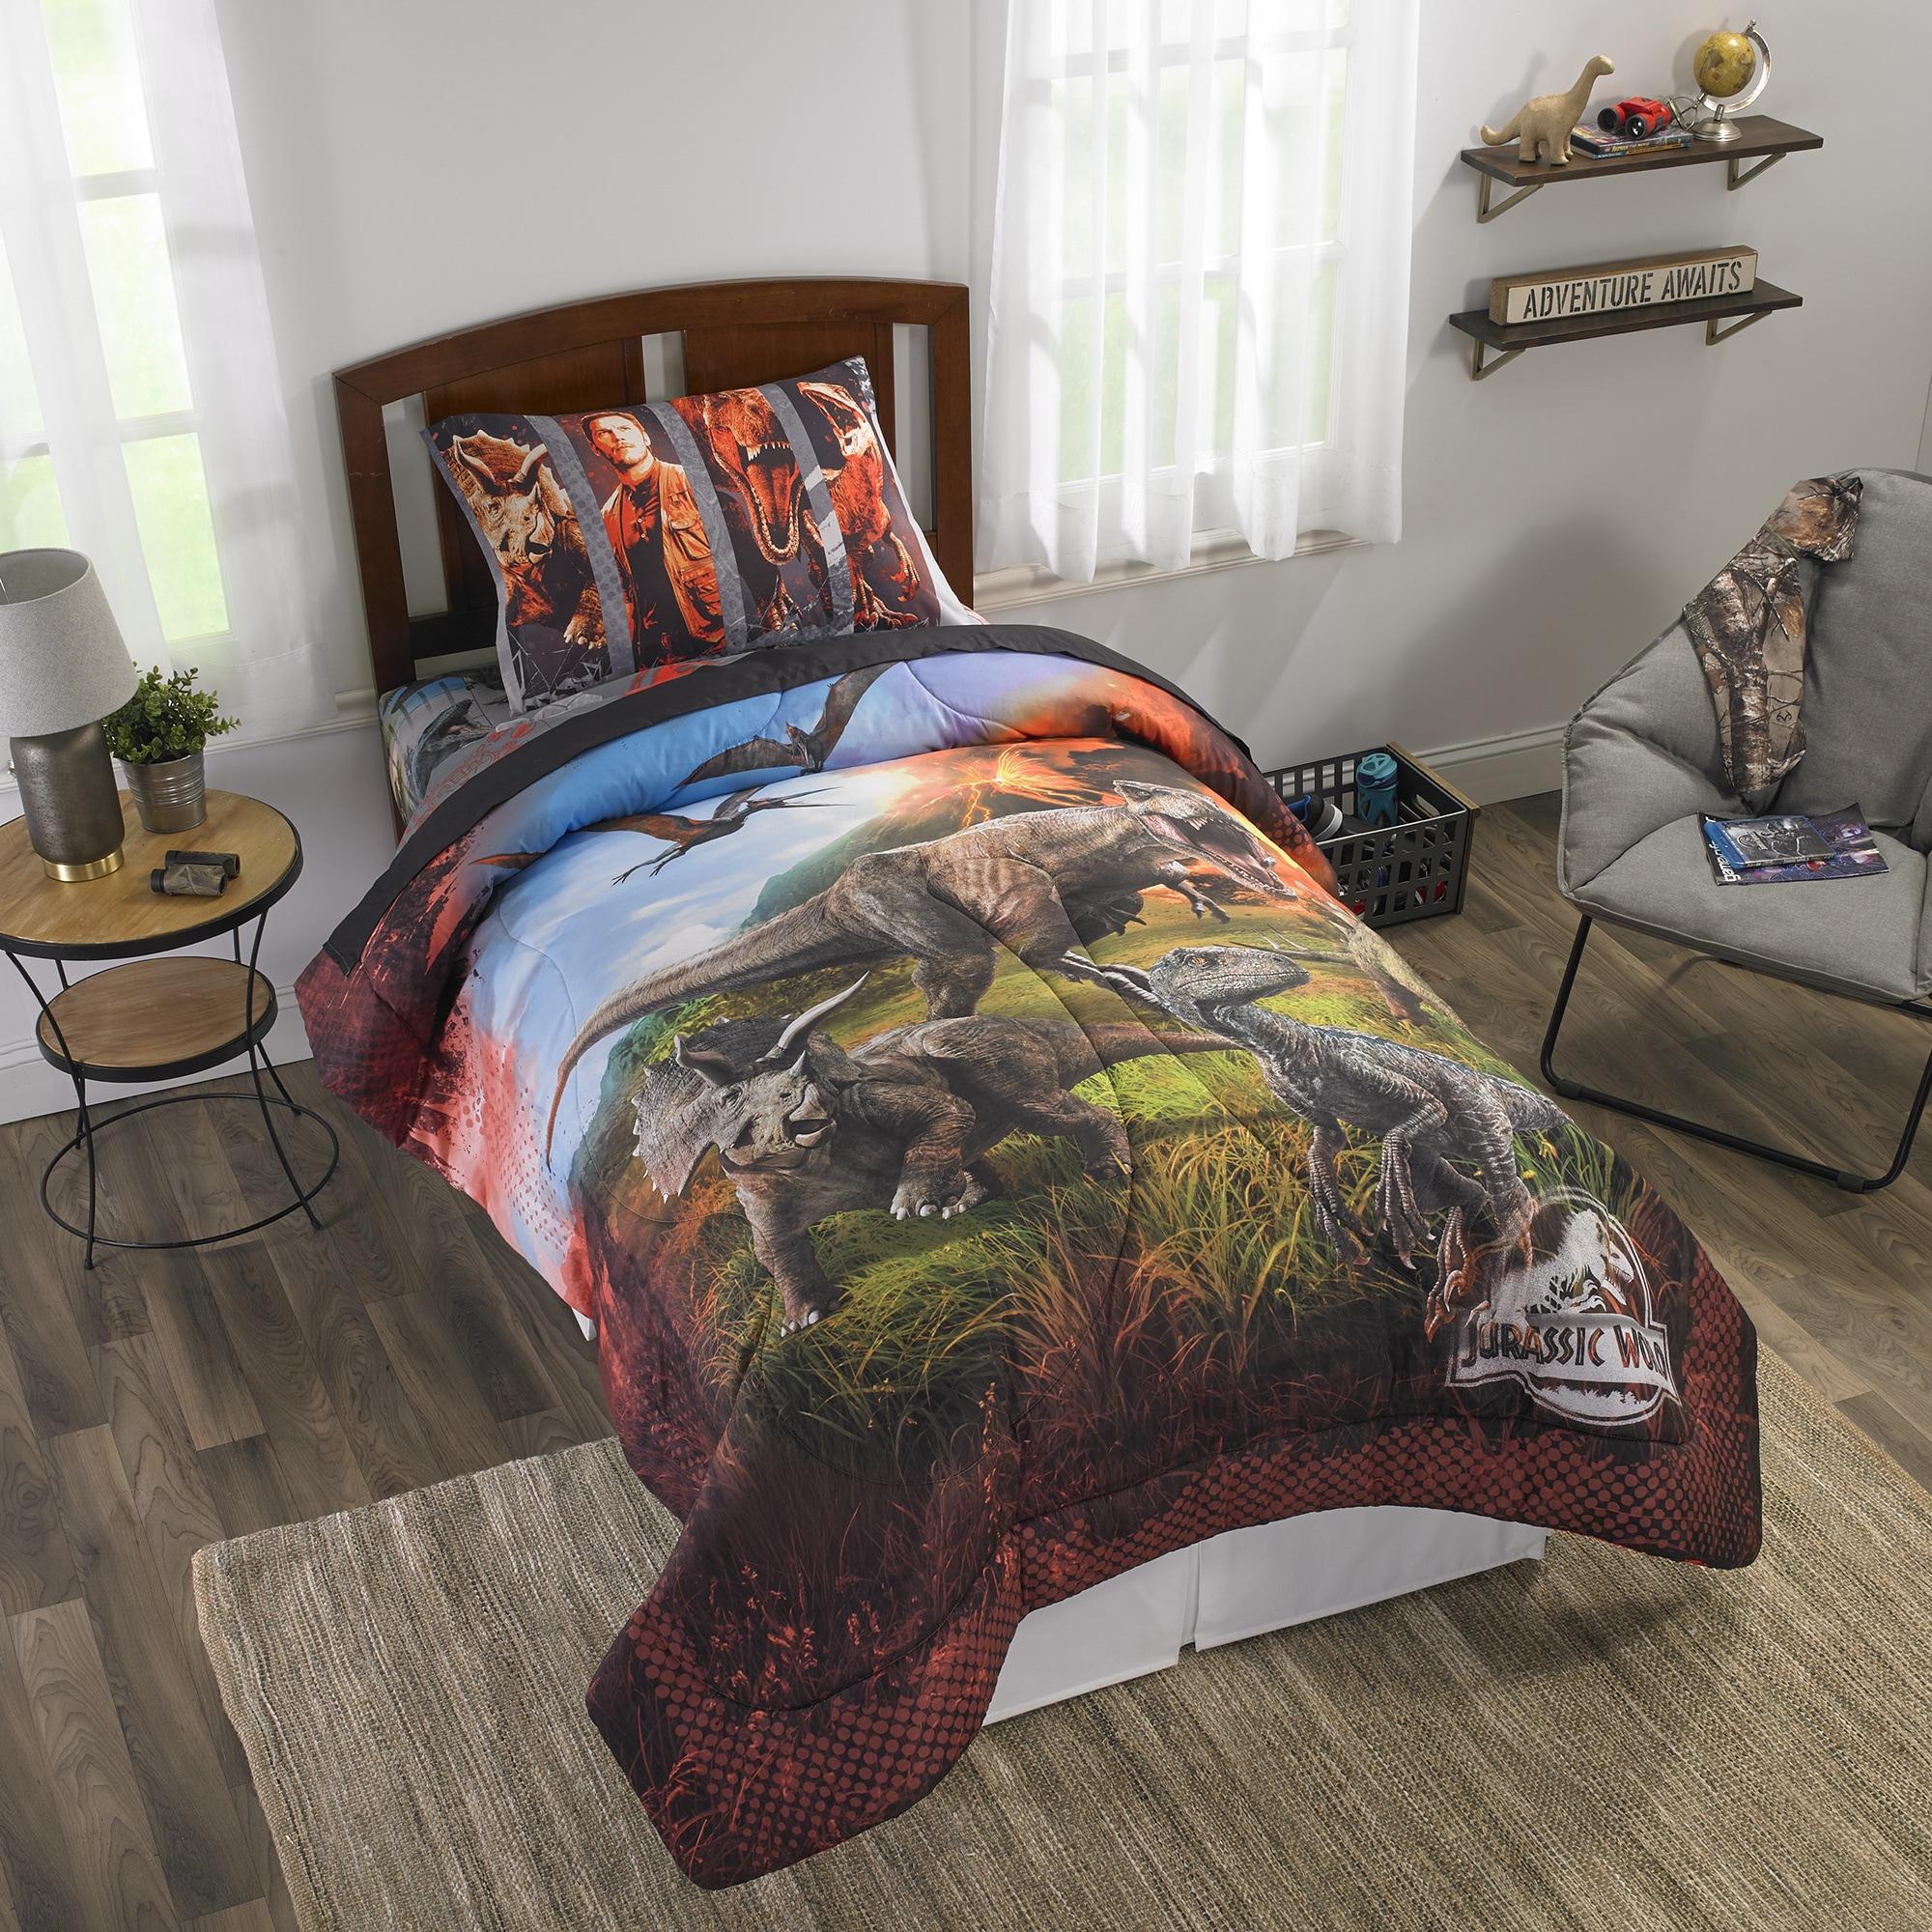 LO 2 Piece Kids Black Blue Green Jurassic Park Comforter Twin//Full Set Dinosaur